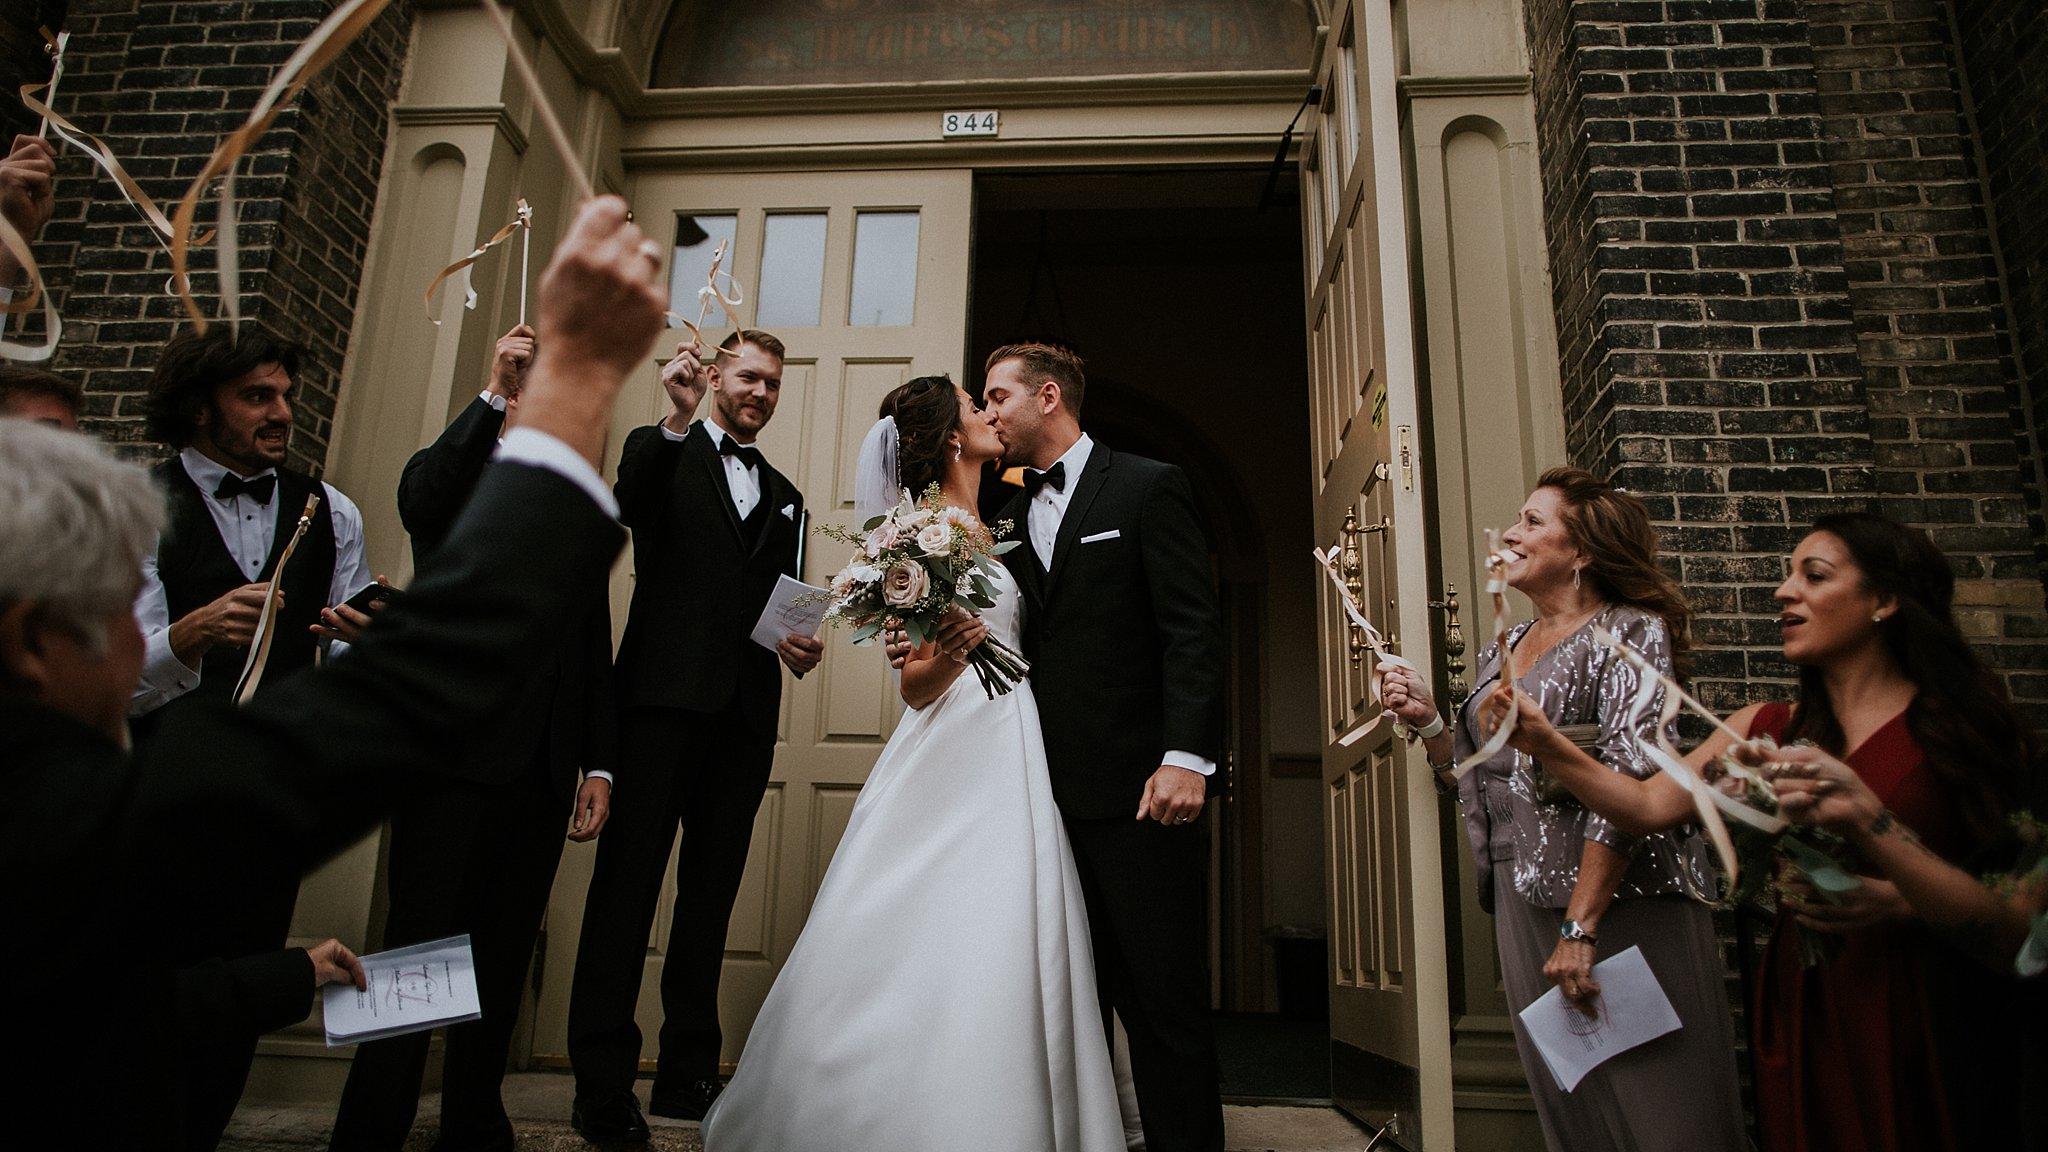 Matt-Lauren_St-Marys_Hilton-City-Center-Milwaukee-Wedding_liller-photo_0031.jpg